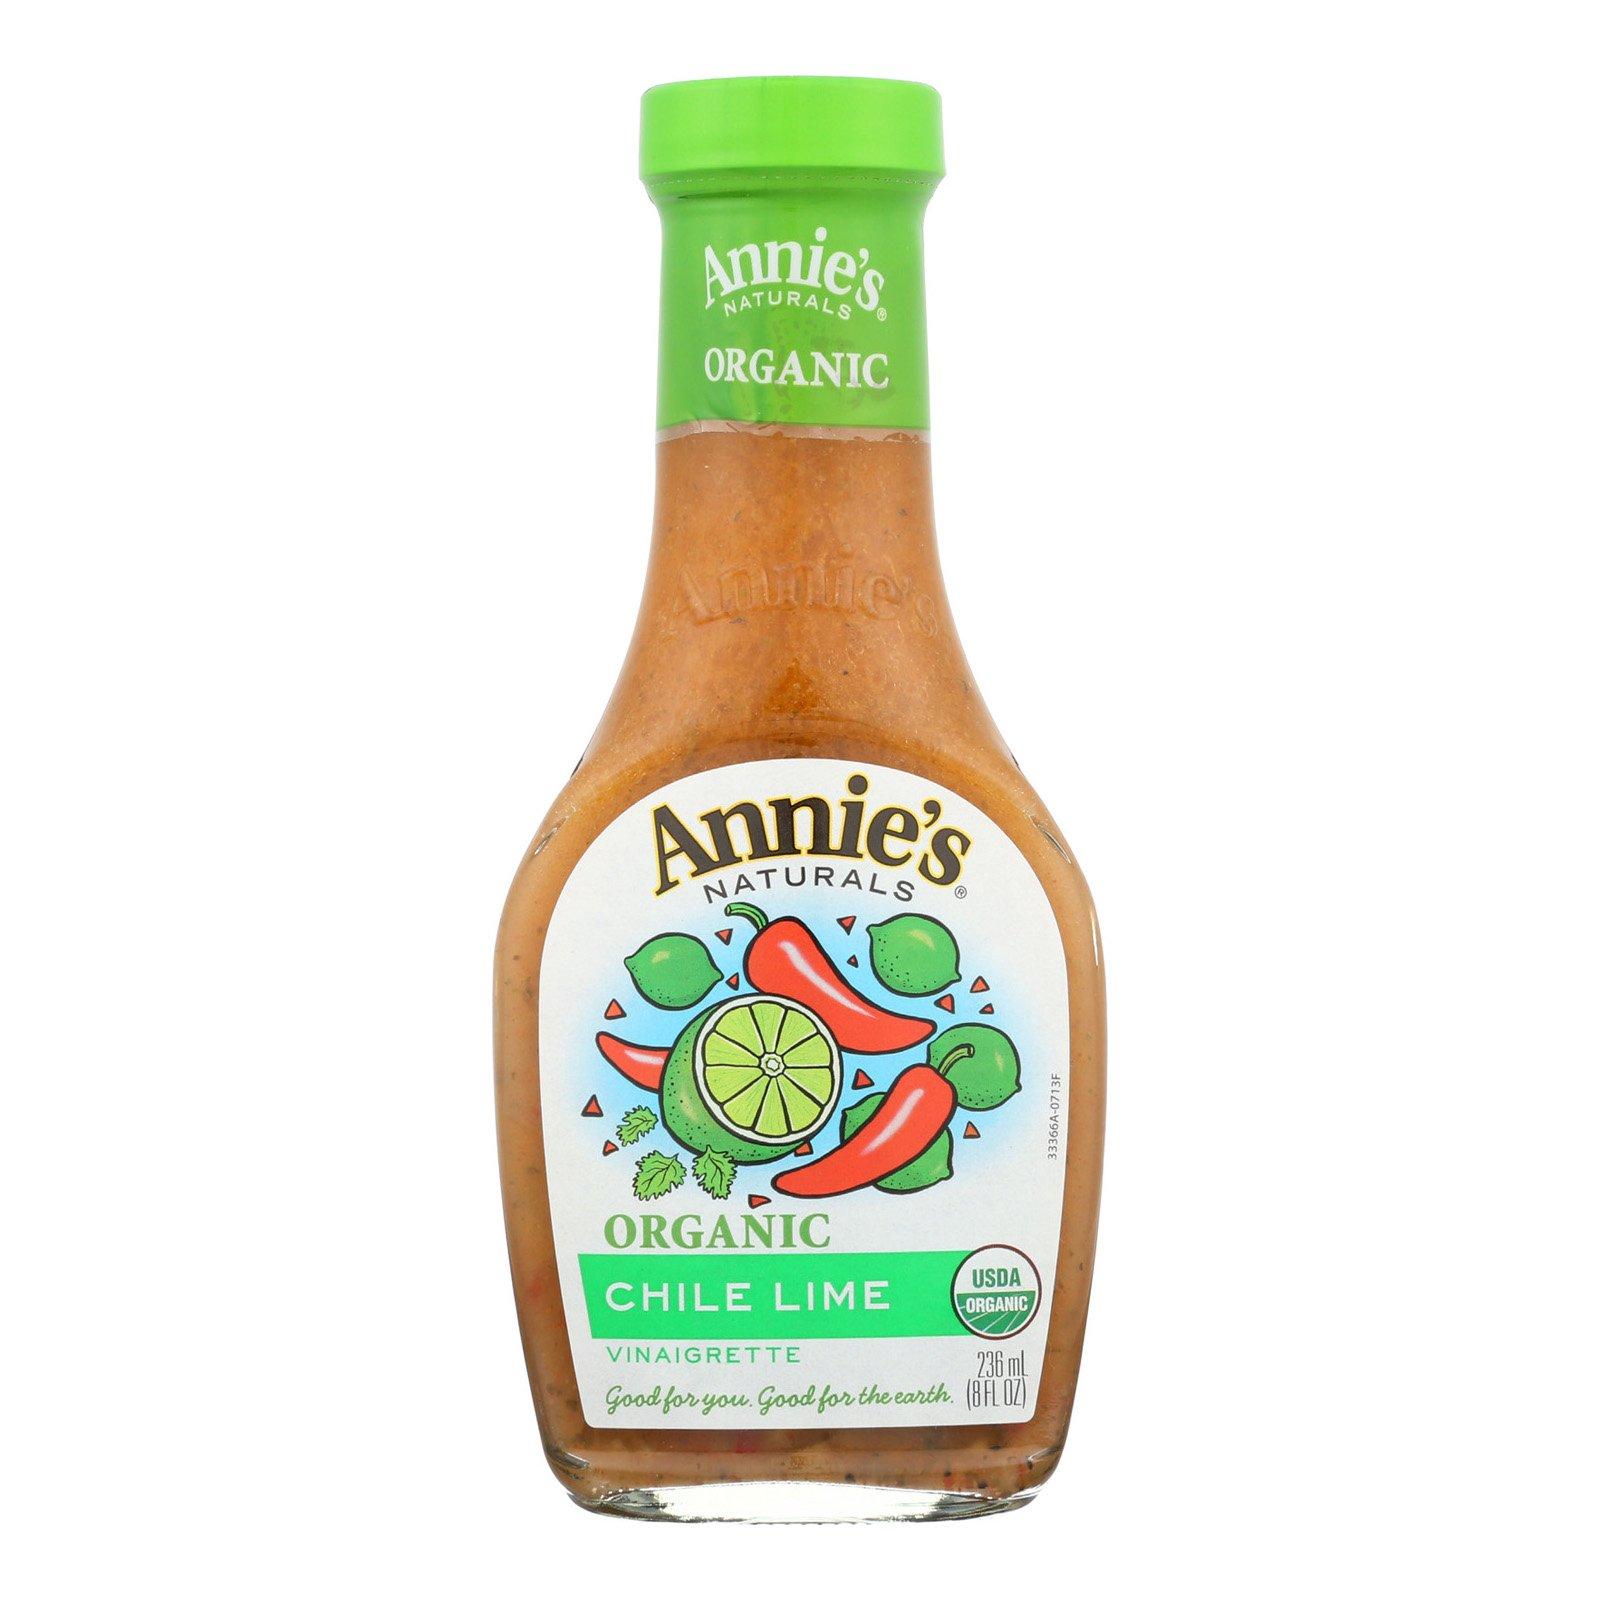 Annie's Naturals Vinaigrette Organic Chile Lime - Case of 6-8 fl oz.